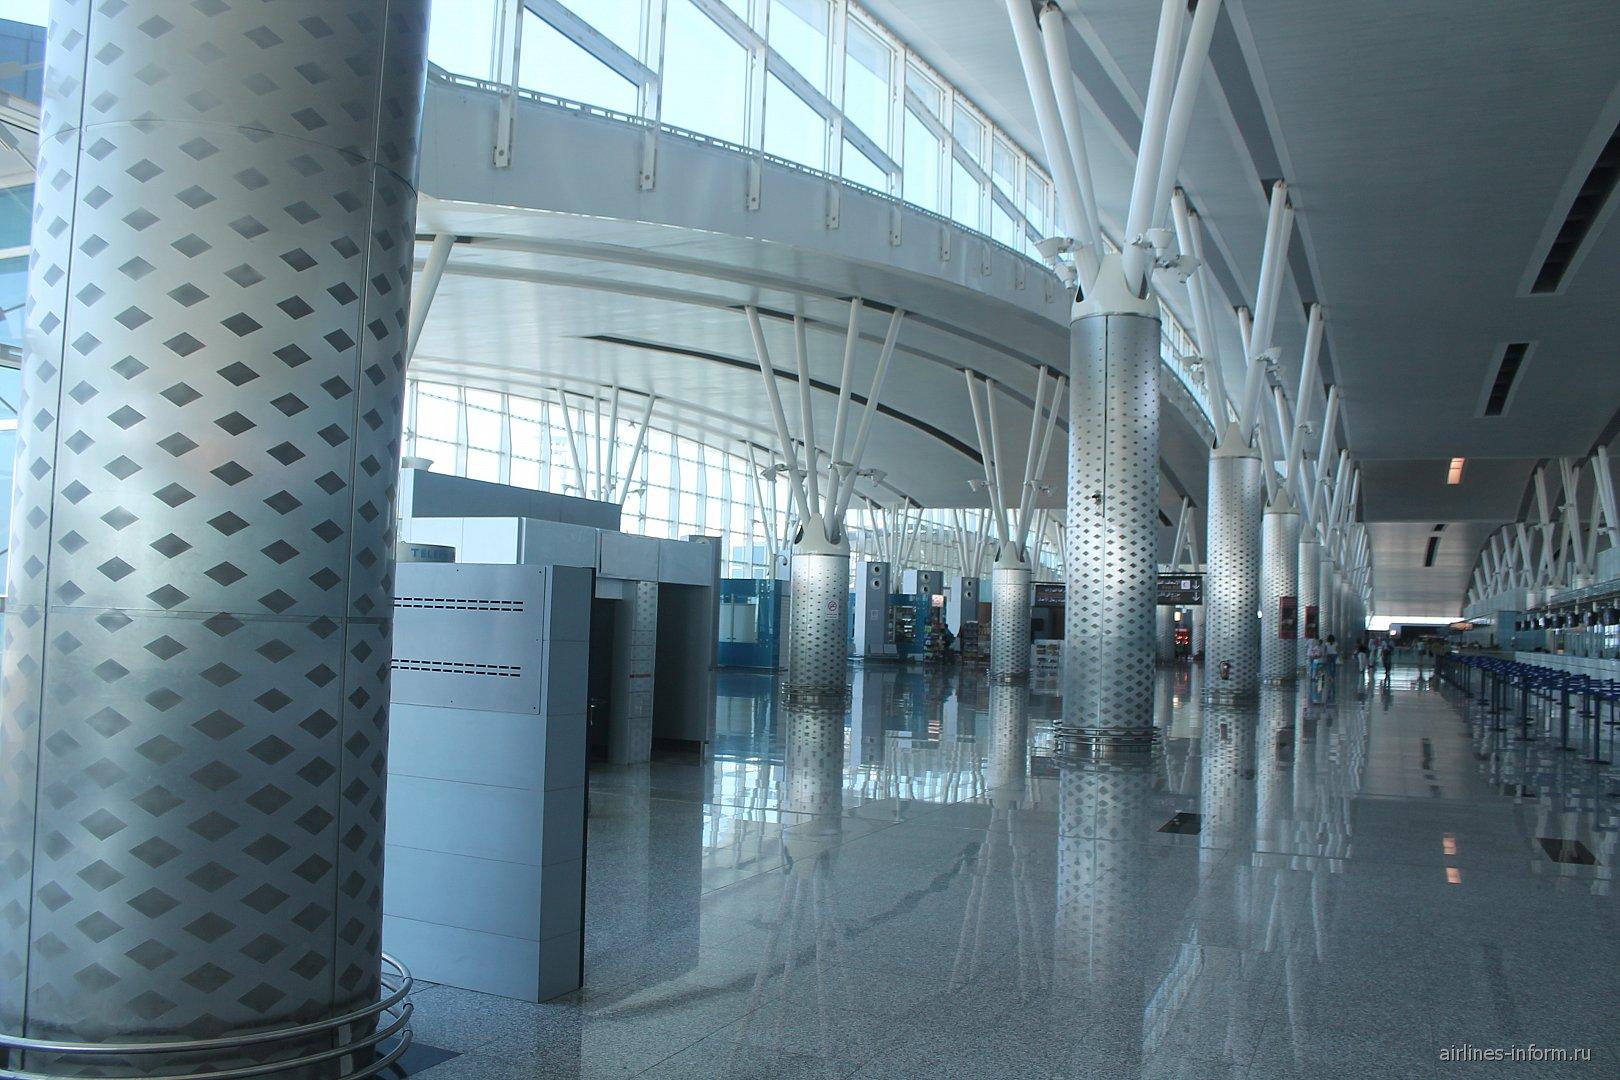 В аэровокзале аэропорта Энфида-Хаммамет